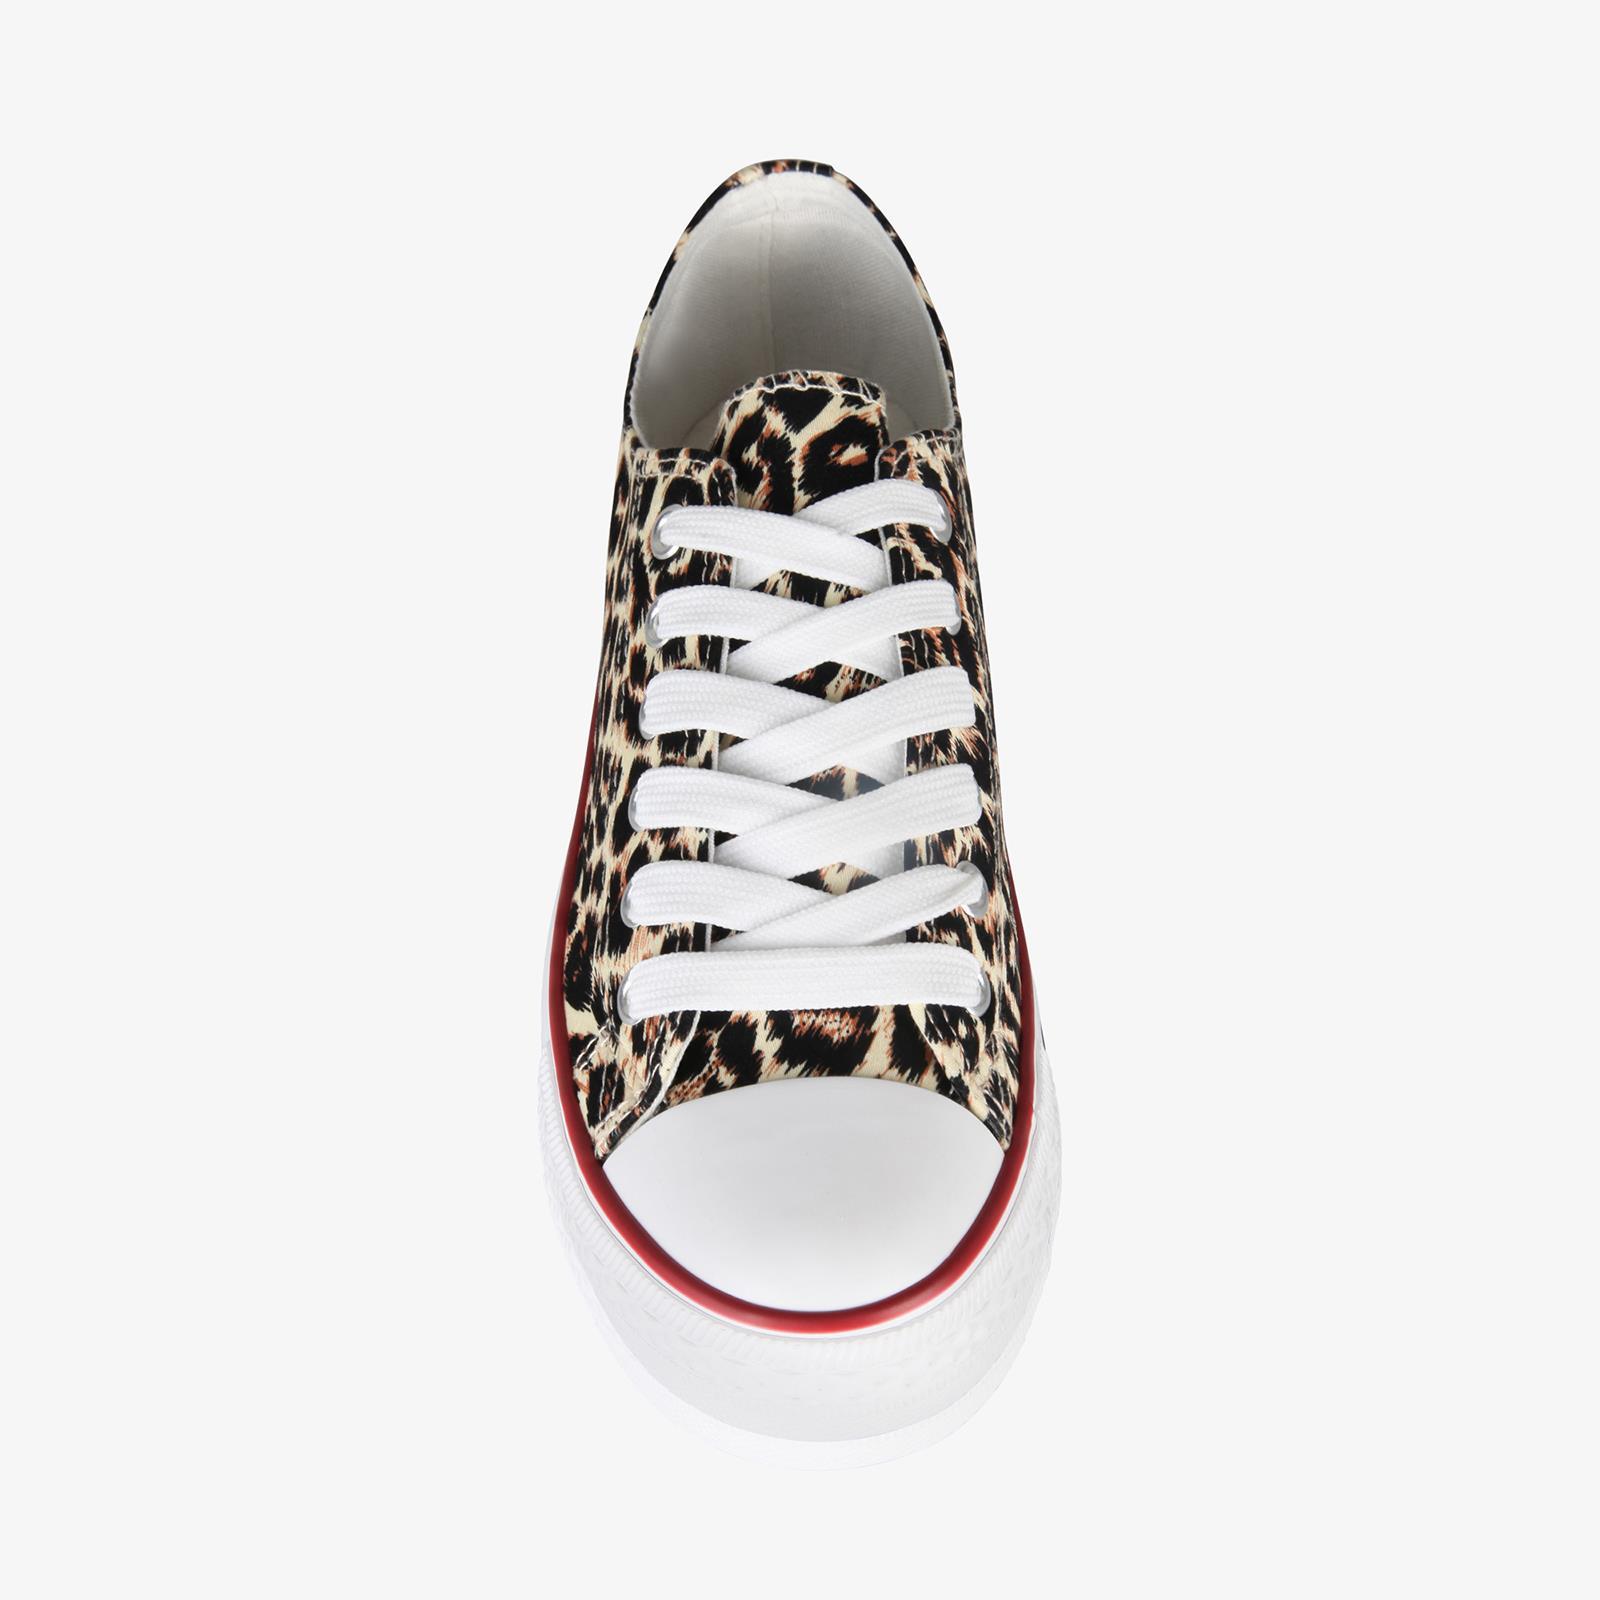 Zapatillas-Mujer-Casuales-Deportiva-Barata-Lona-Moda-Originales-Outlet-Tela-Moda miniatura 24